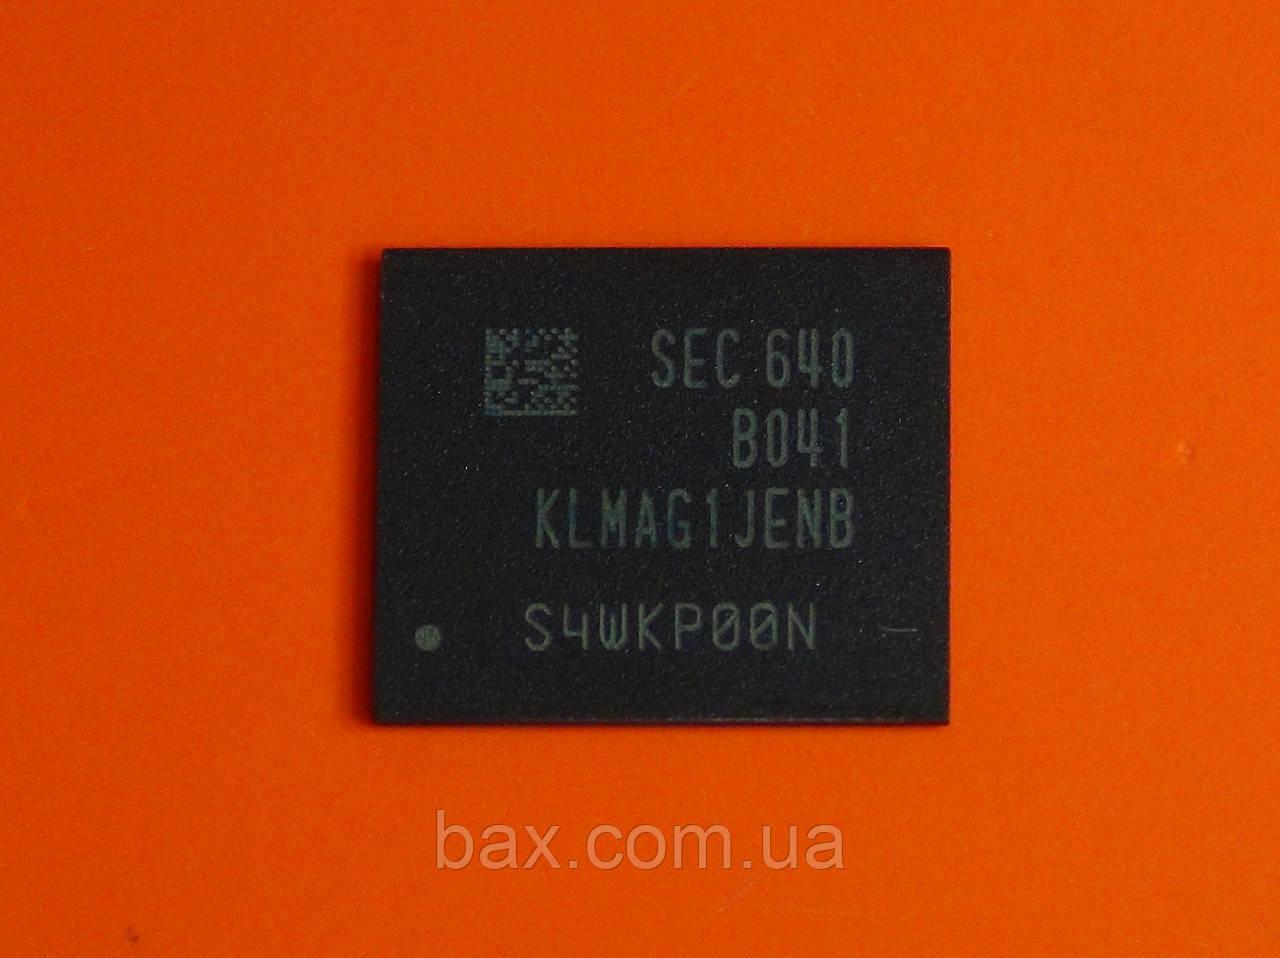 Микросхема памяти Samsung KLMAG1JENB-B041 Описание